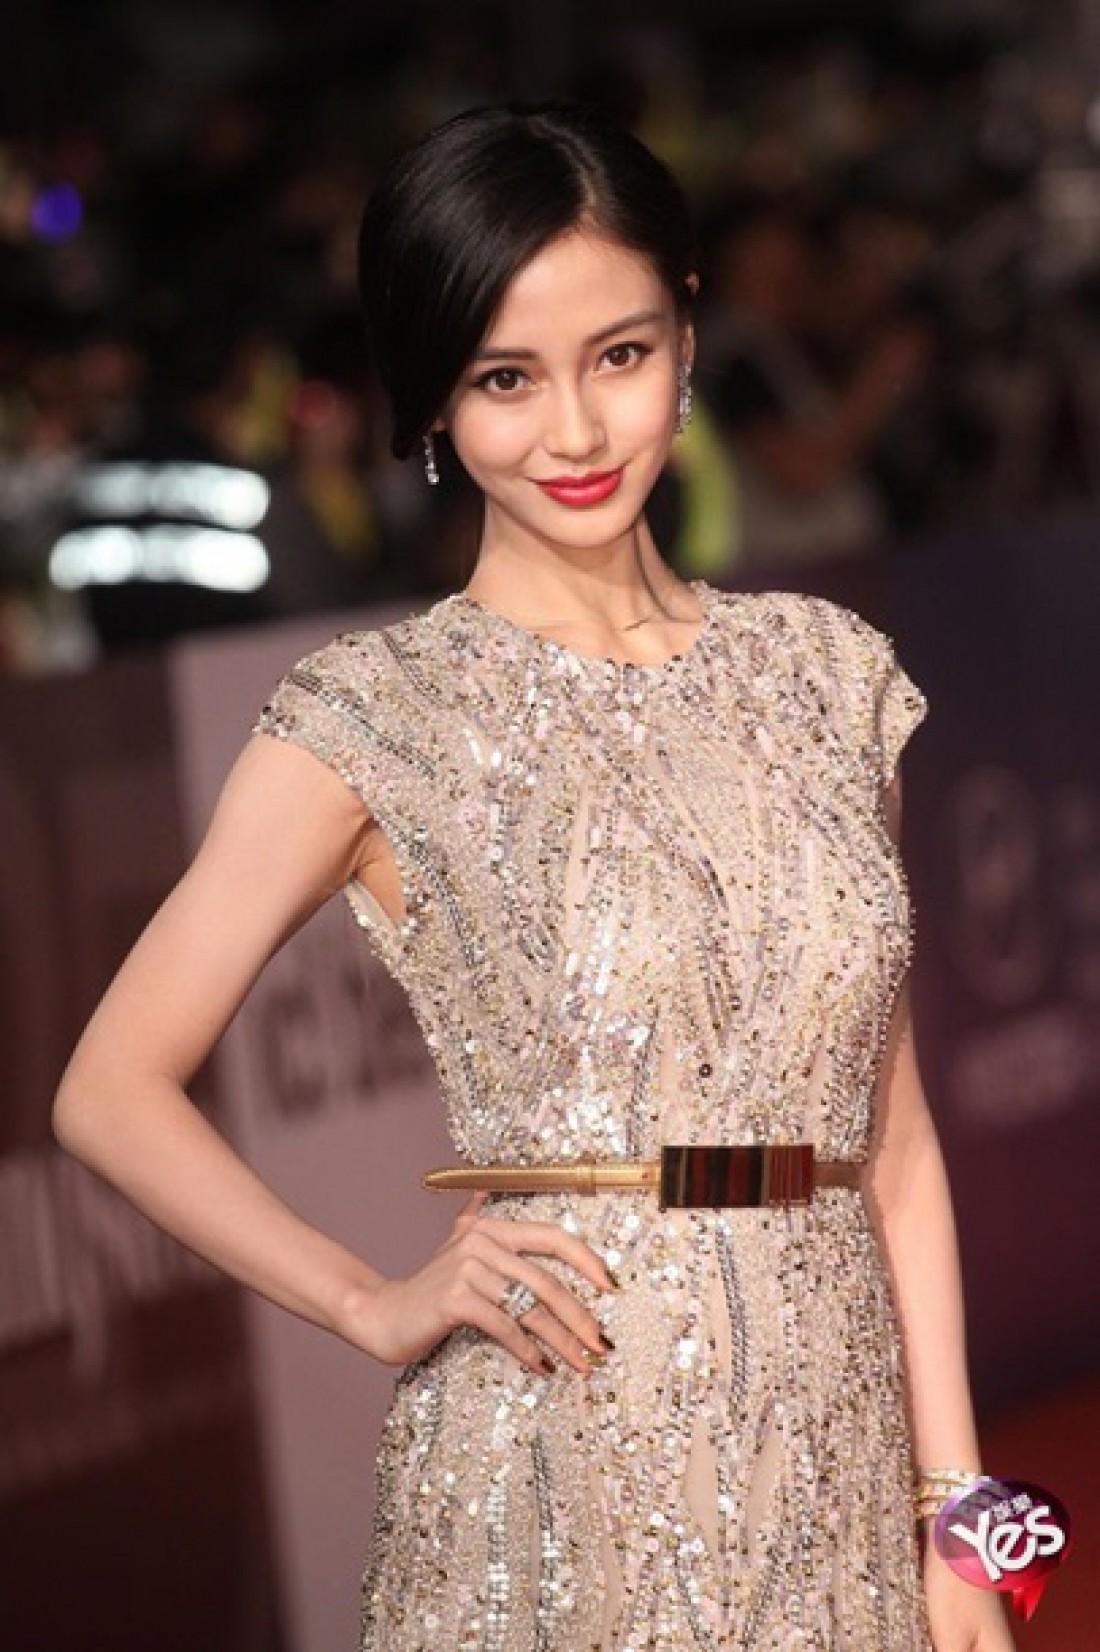 Китайская актриса Ян Вин